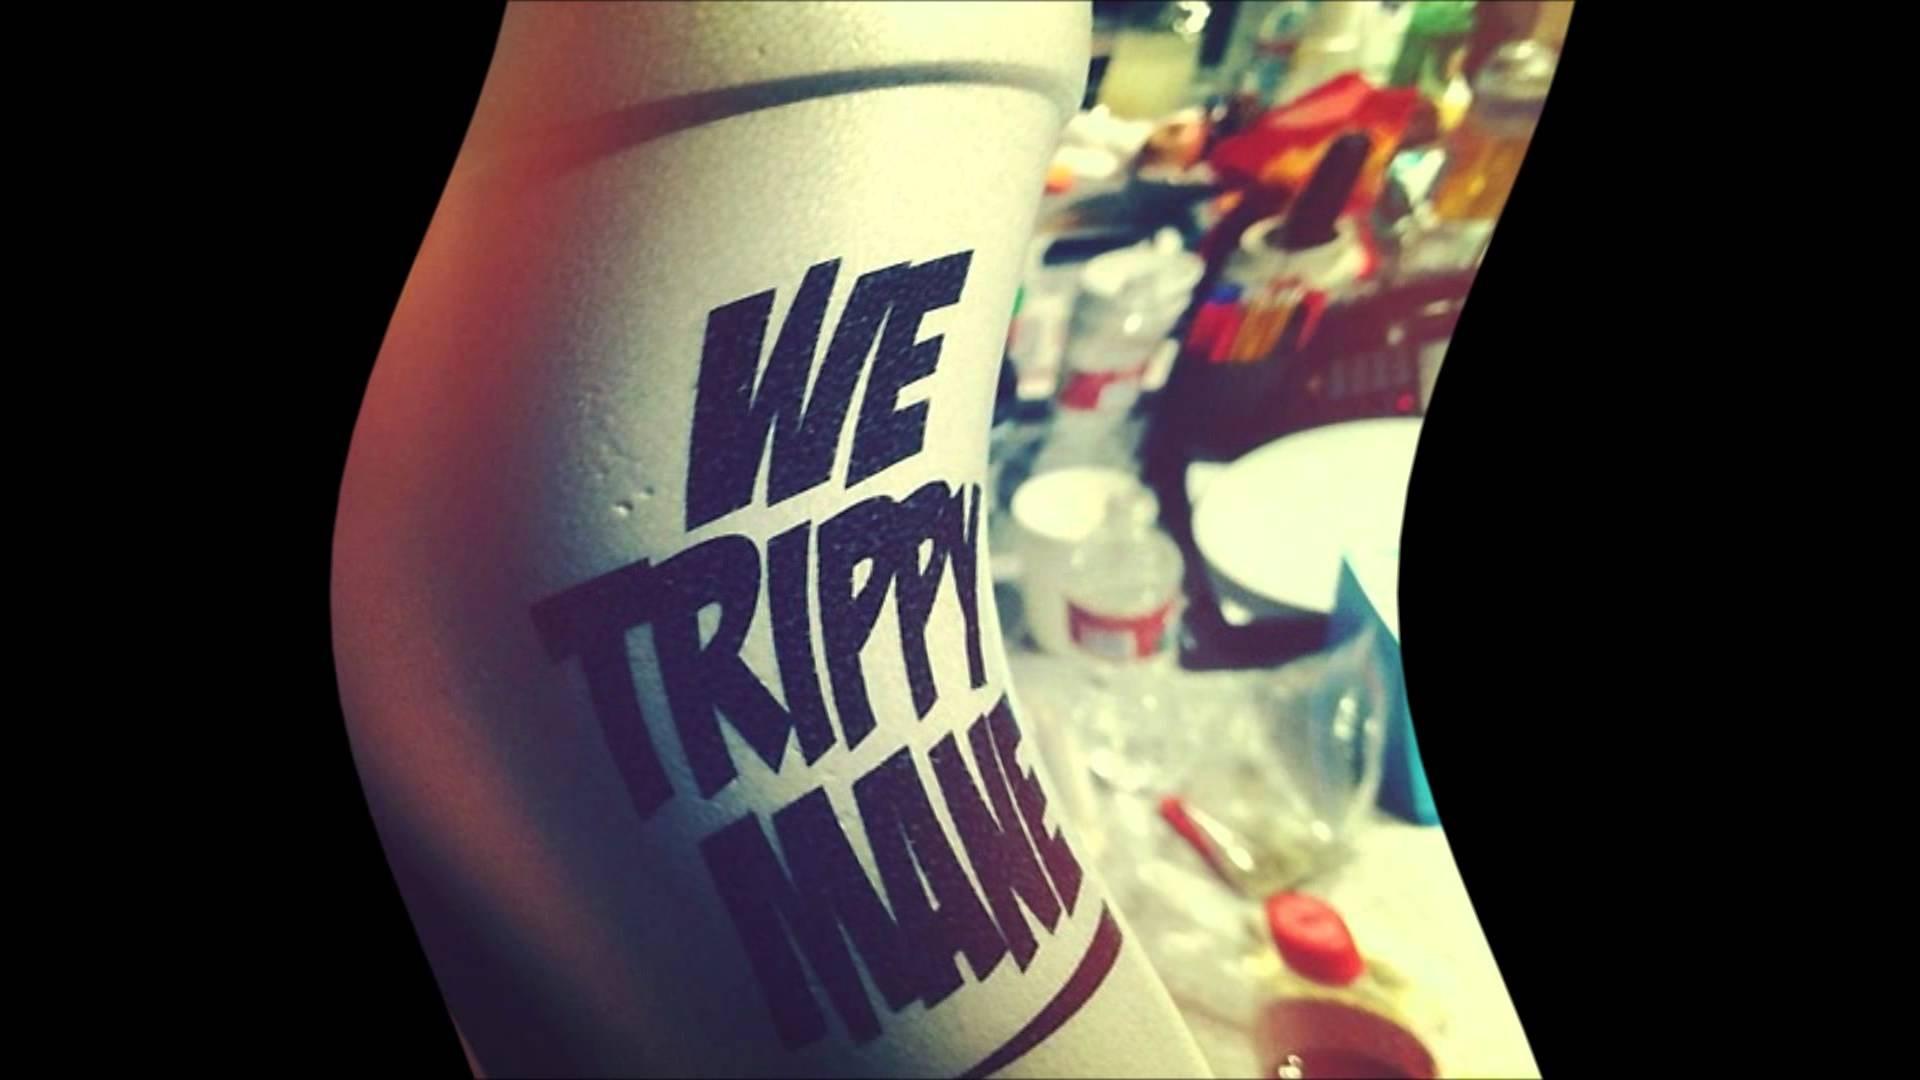 We Trippy Wallpaper